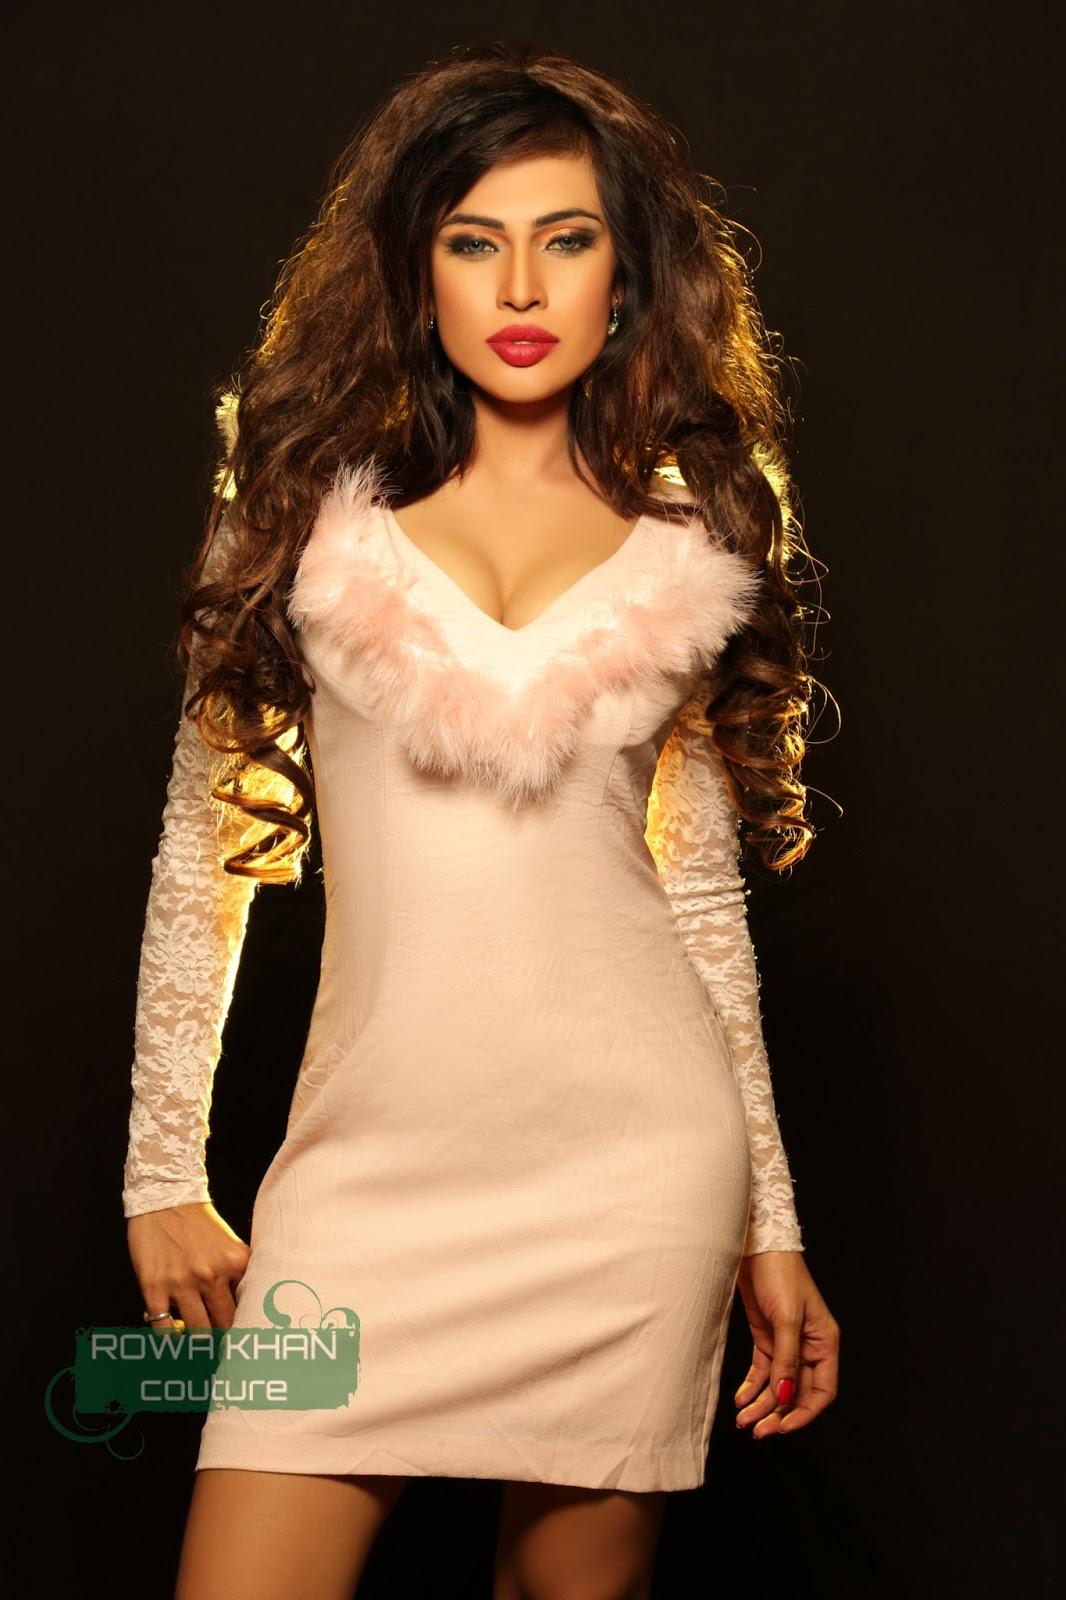 Mumtaz khan fashion designer 3